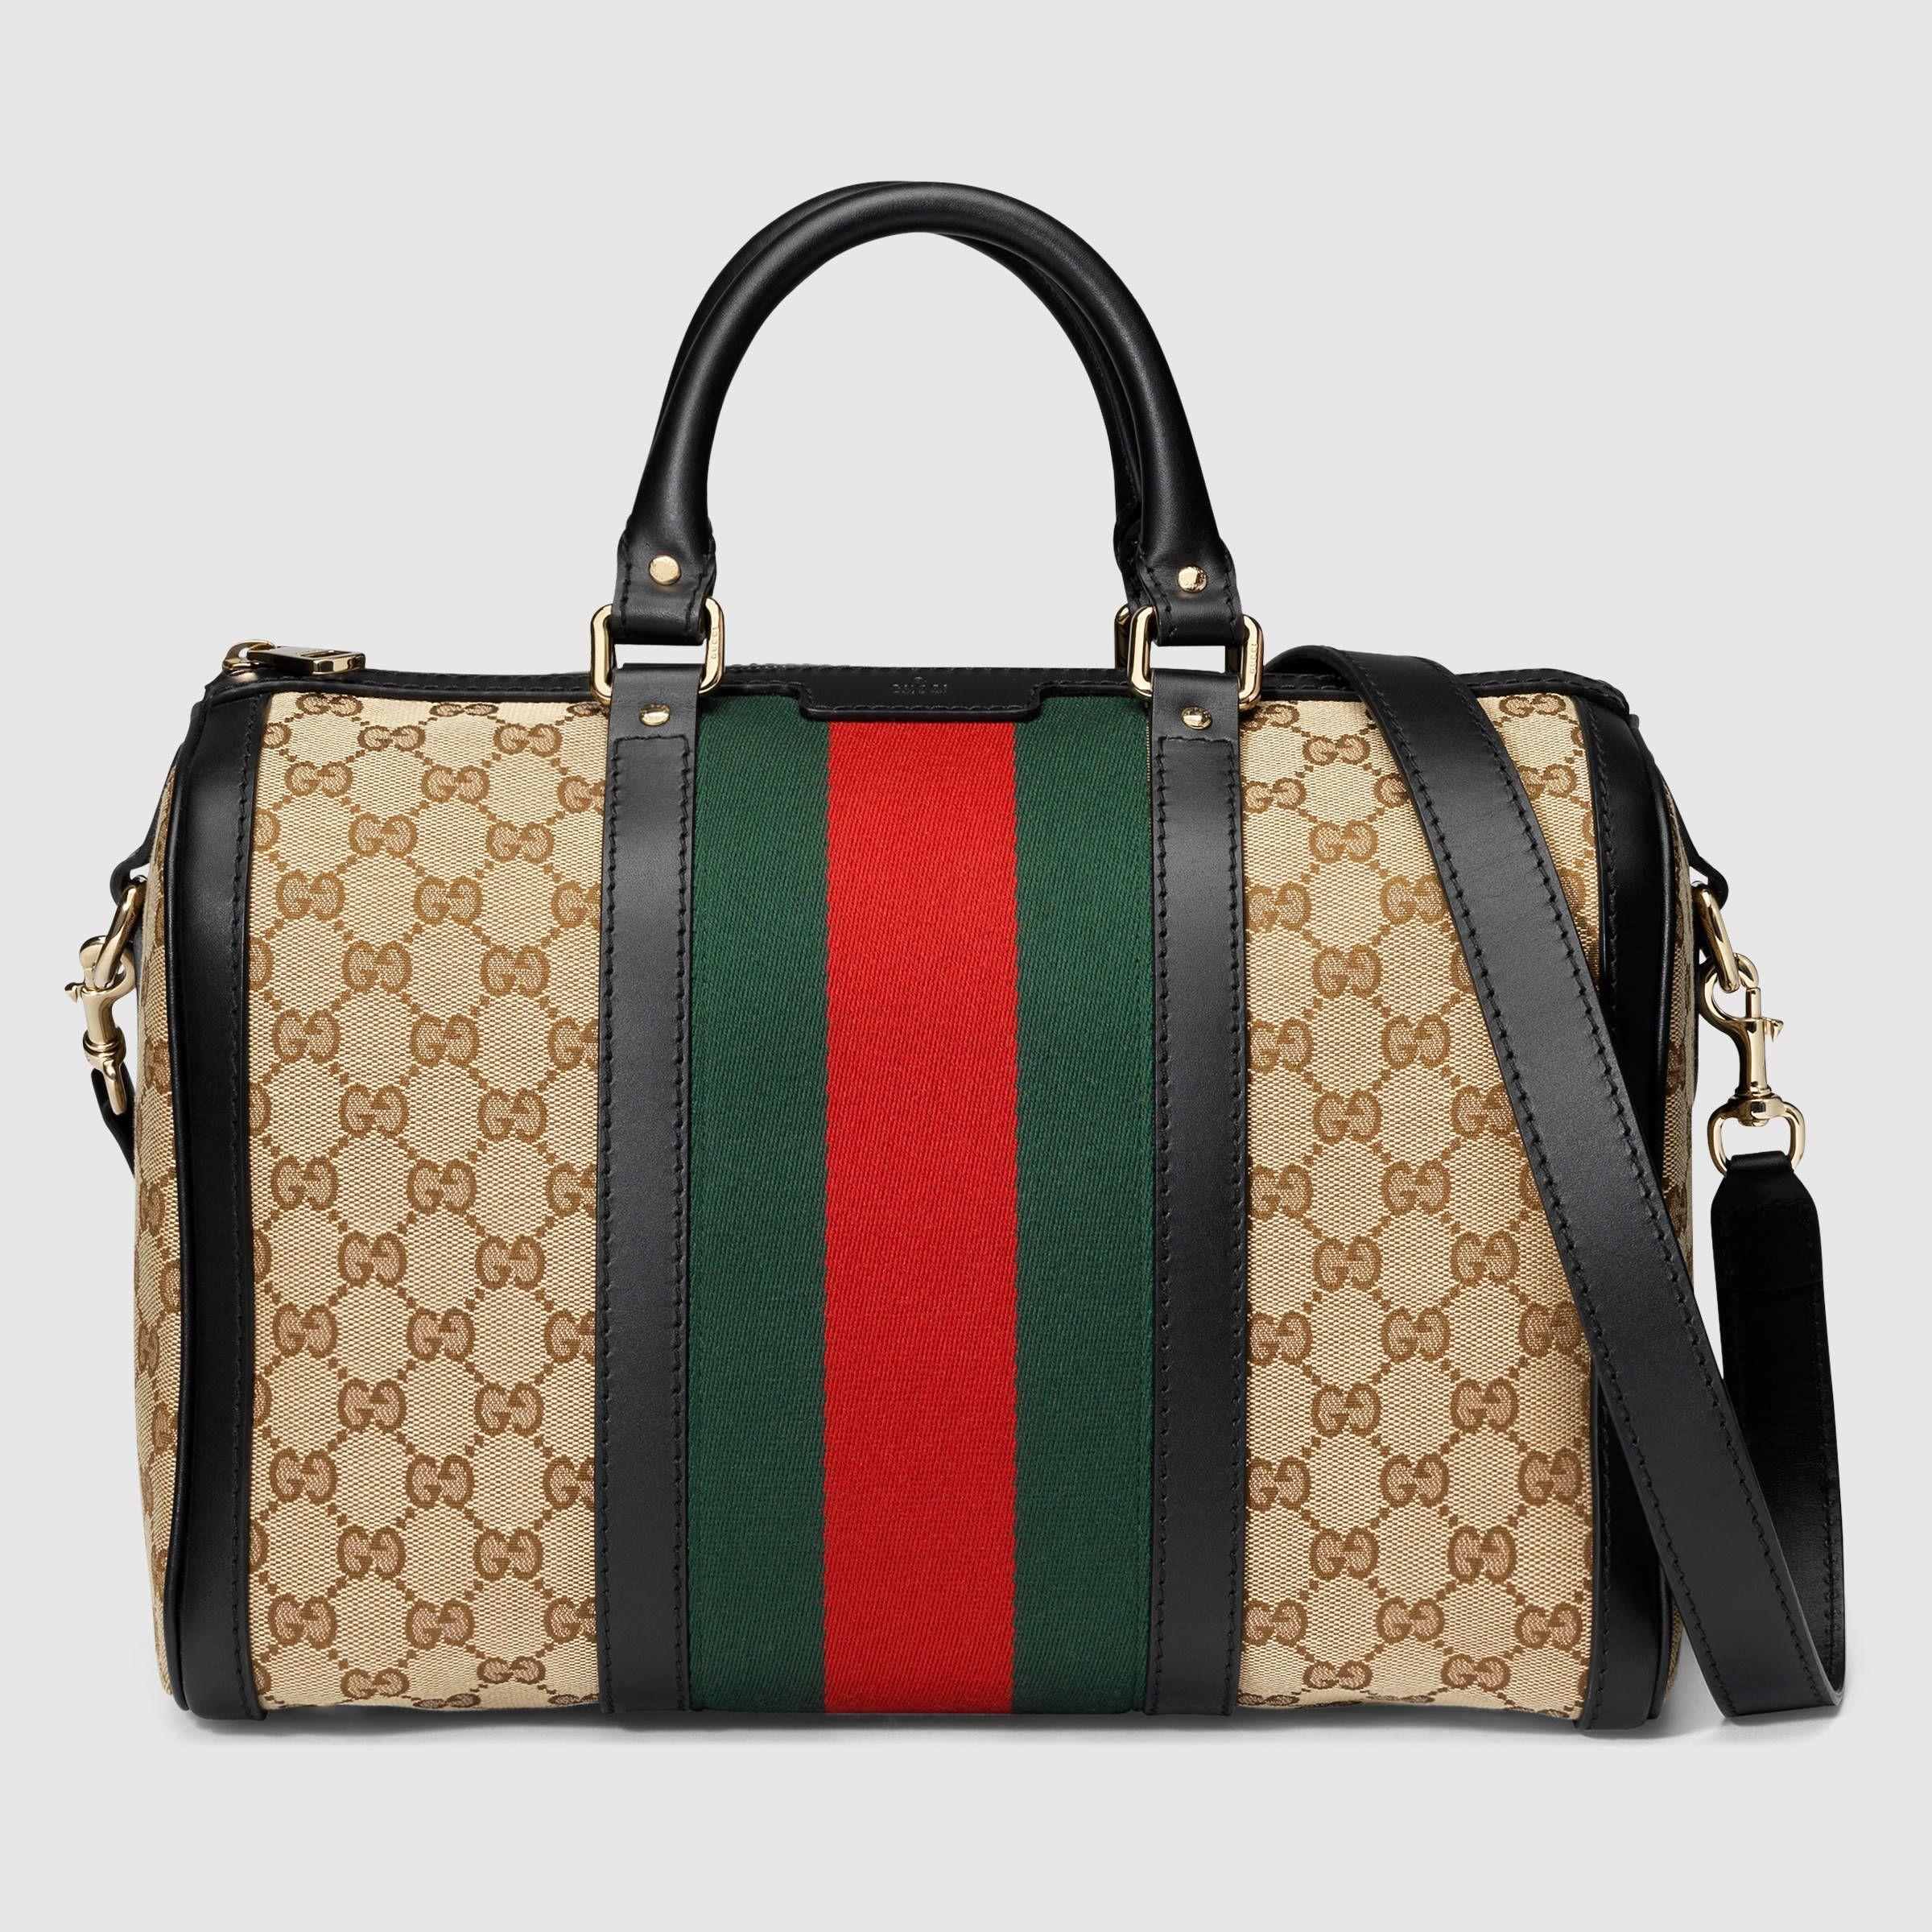 19d53e1baa Gucci Women - Vintage Web Original GG boston bag - 247205KQW5G9775  #guccibostonbag